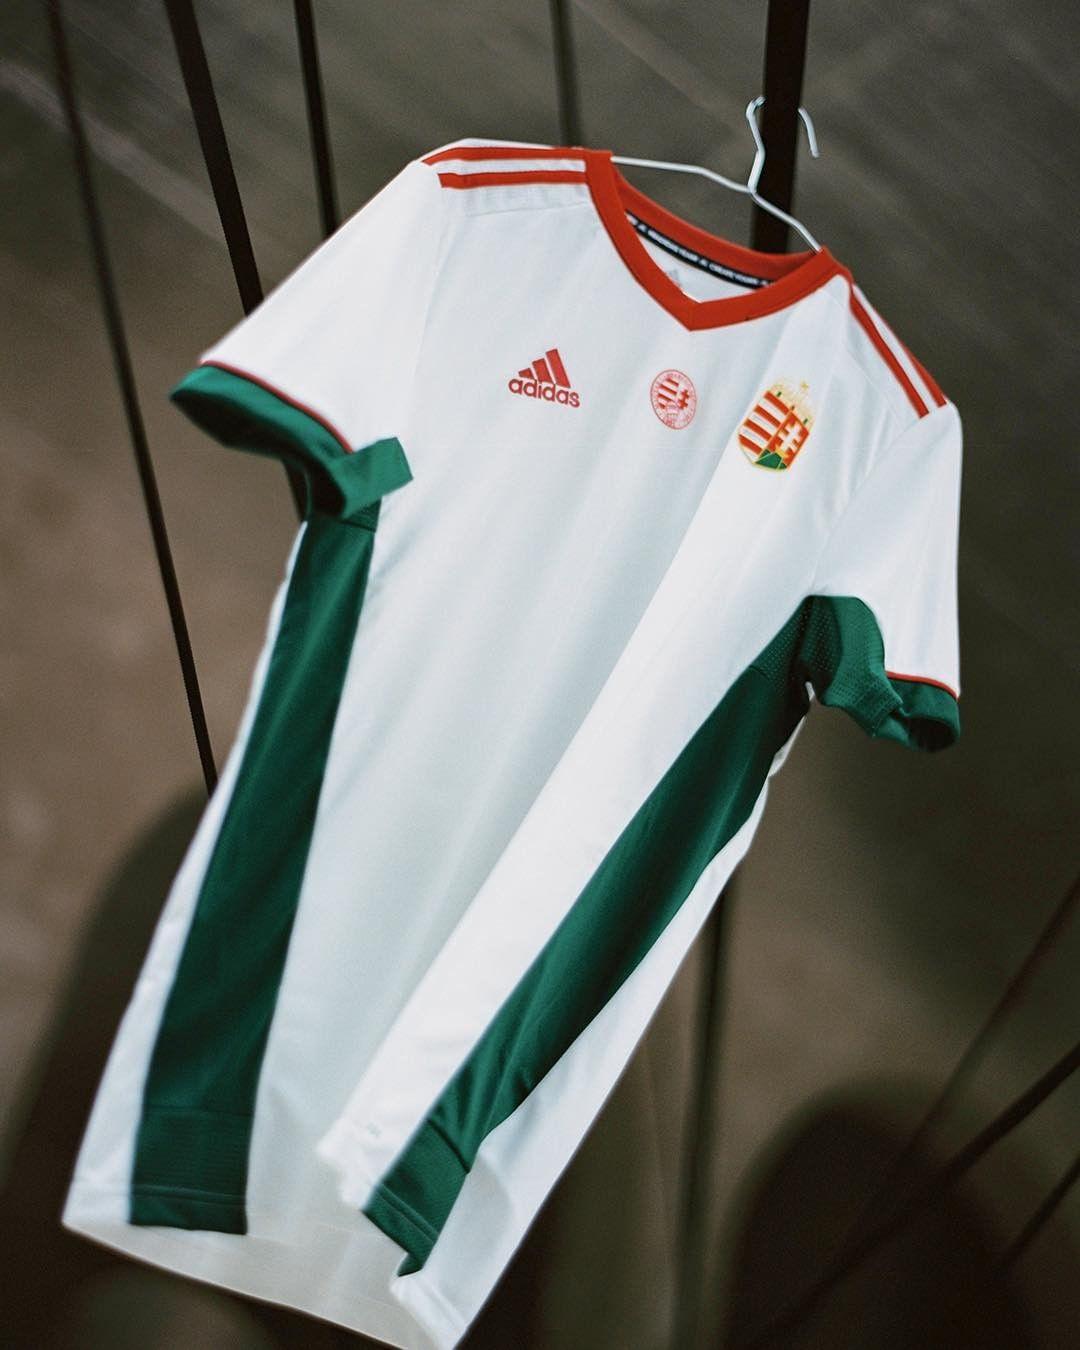 Hungary 2021 Adidas Away Shirt | 20/21 Kits | Football shirt blog